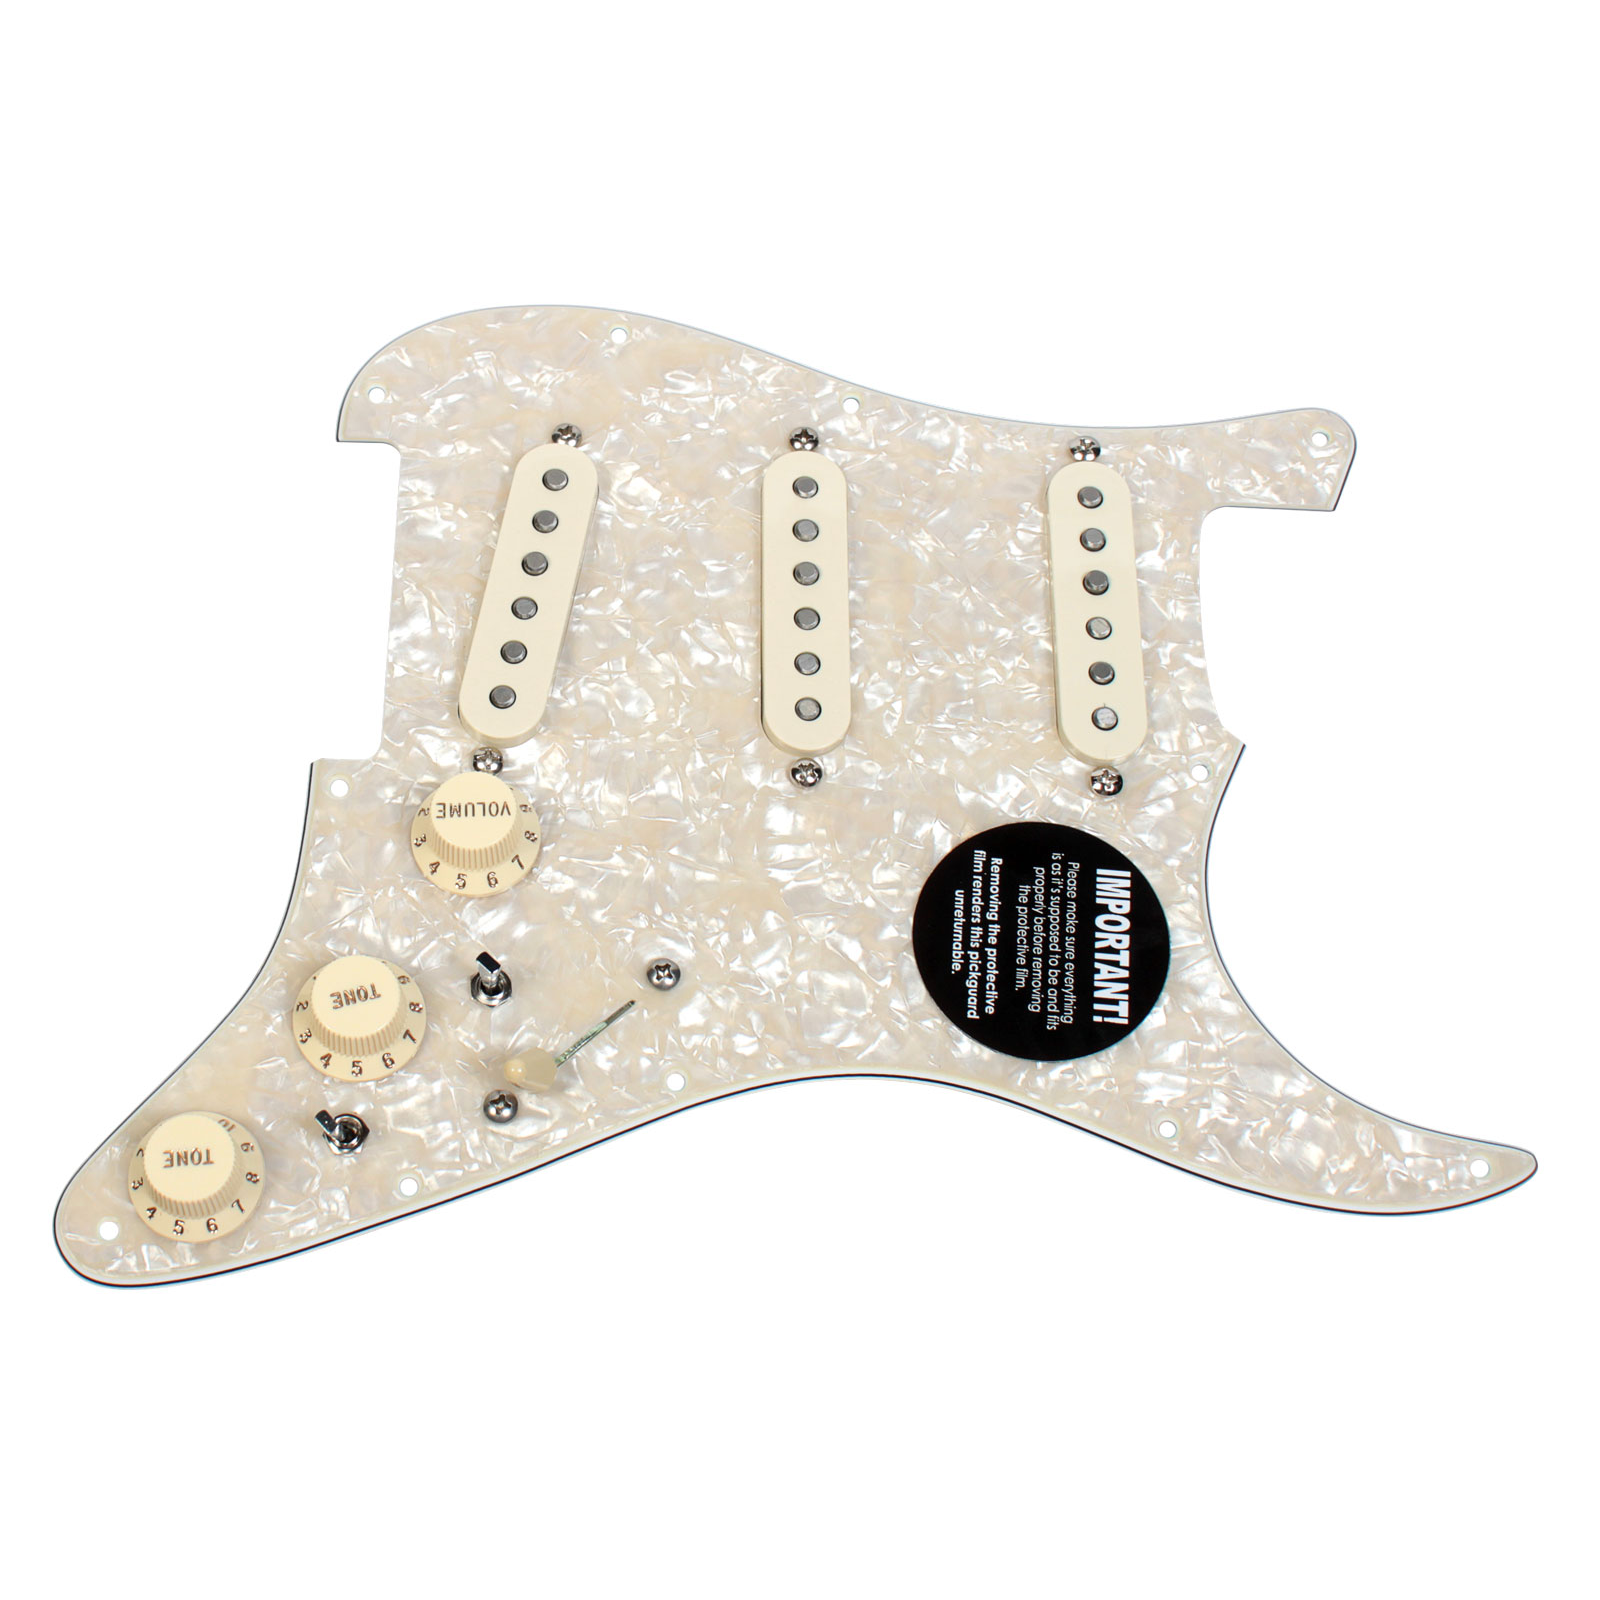 Fender Stratocaster Strat Loaded Pickguard DiMarzio Area Phostenix 9 Way AWP/AW